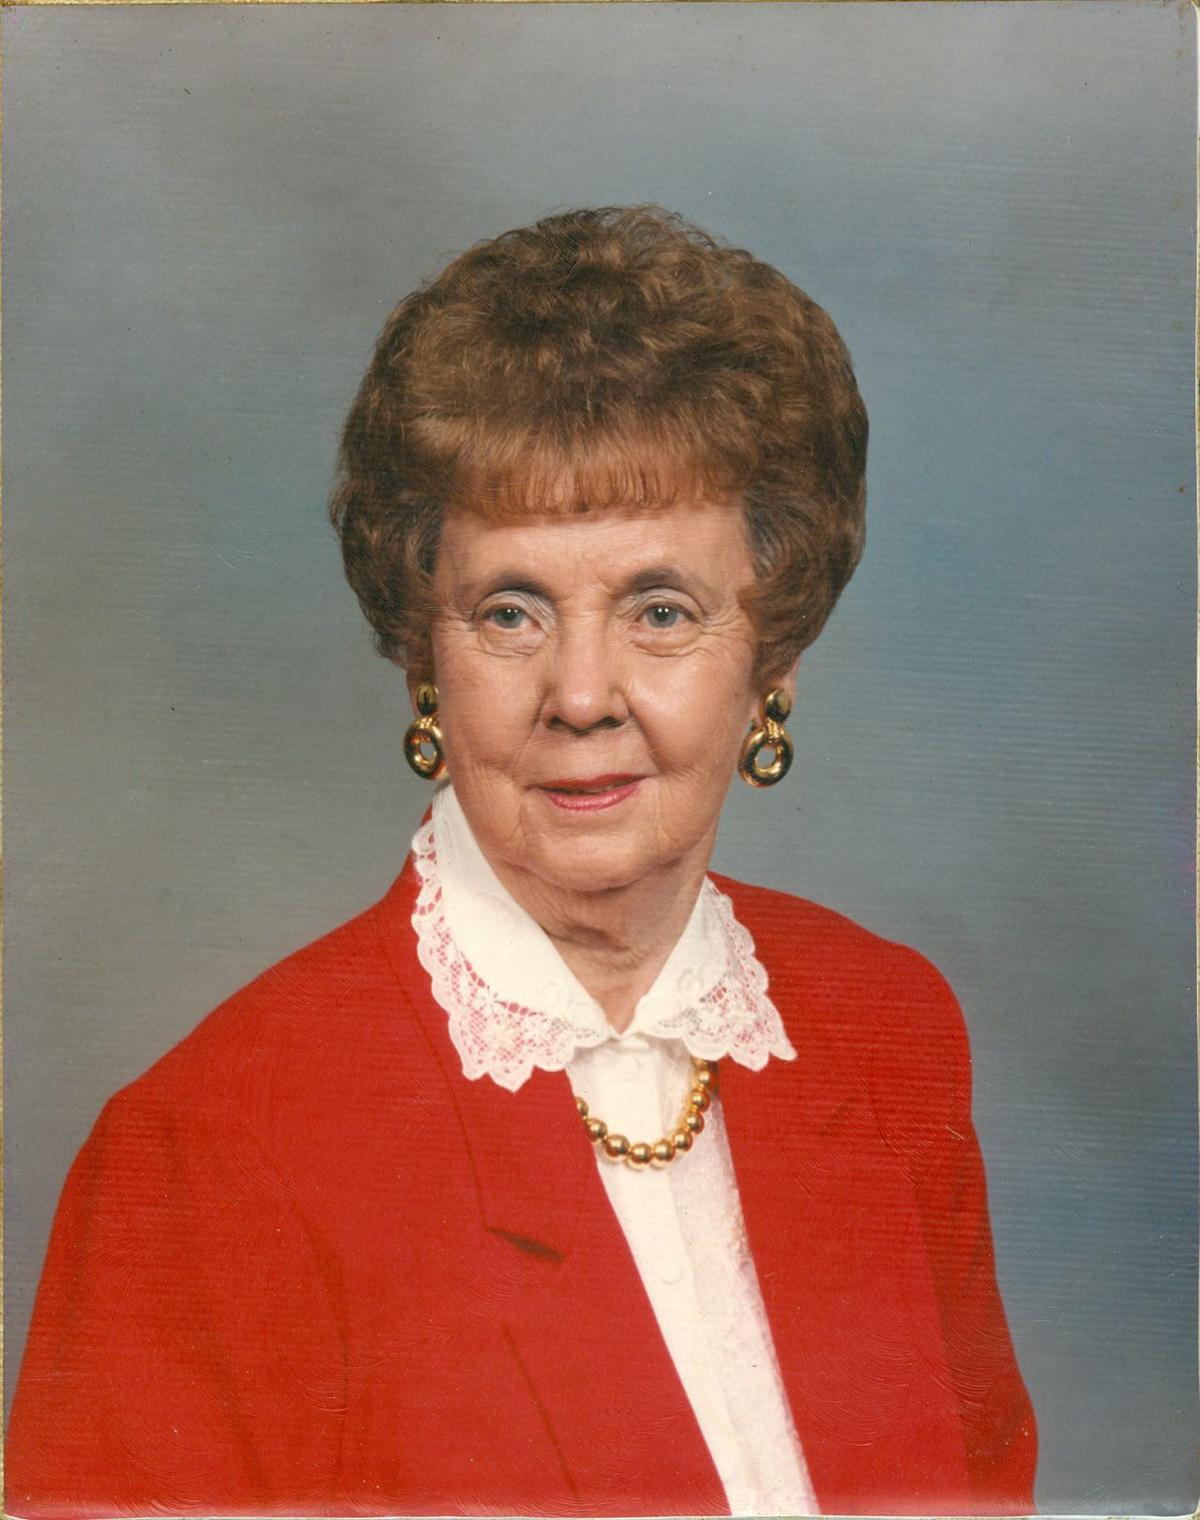 Thelma Clark